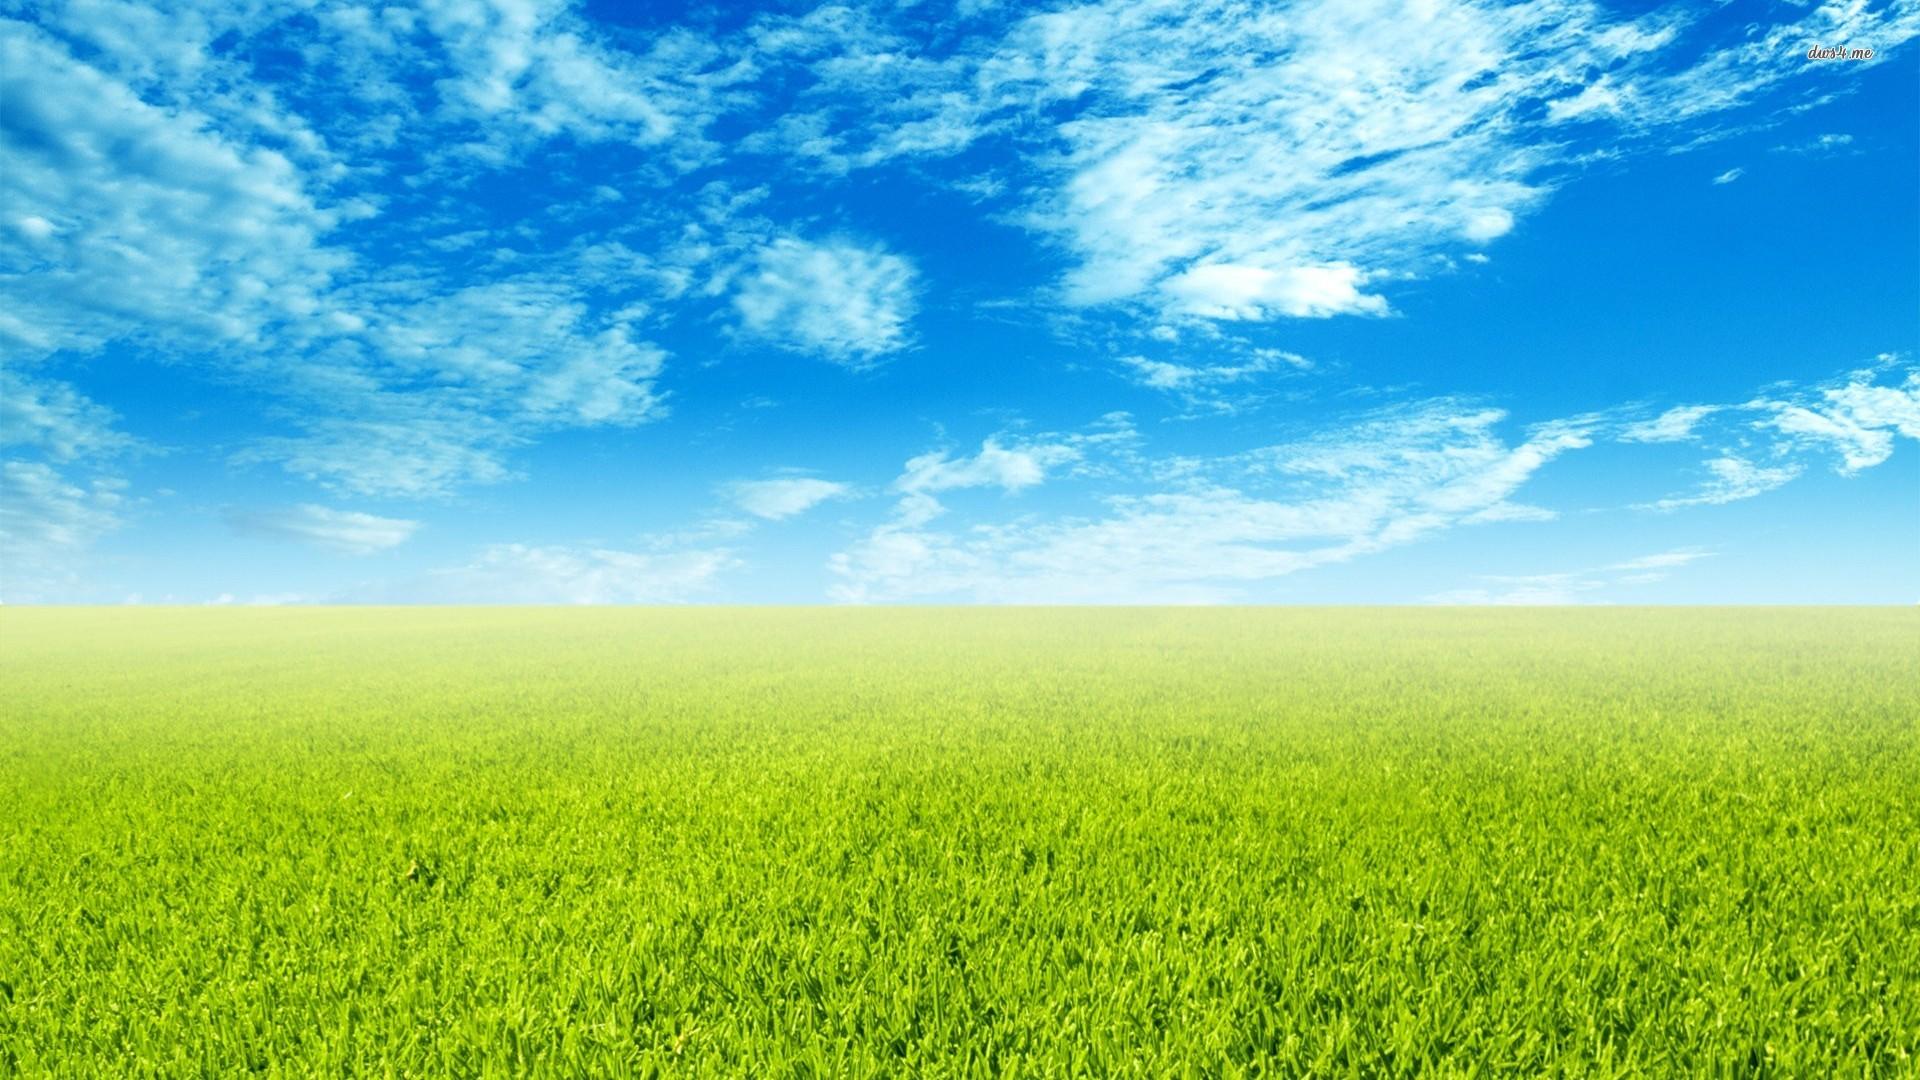 Free Photo: Green Field